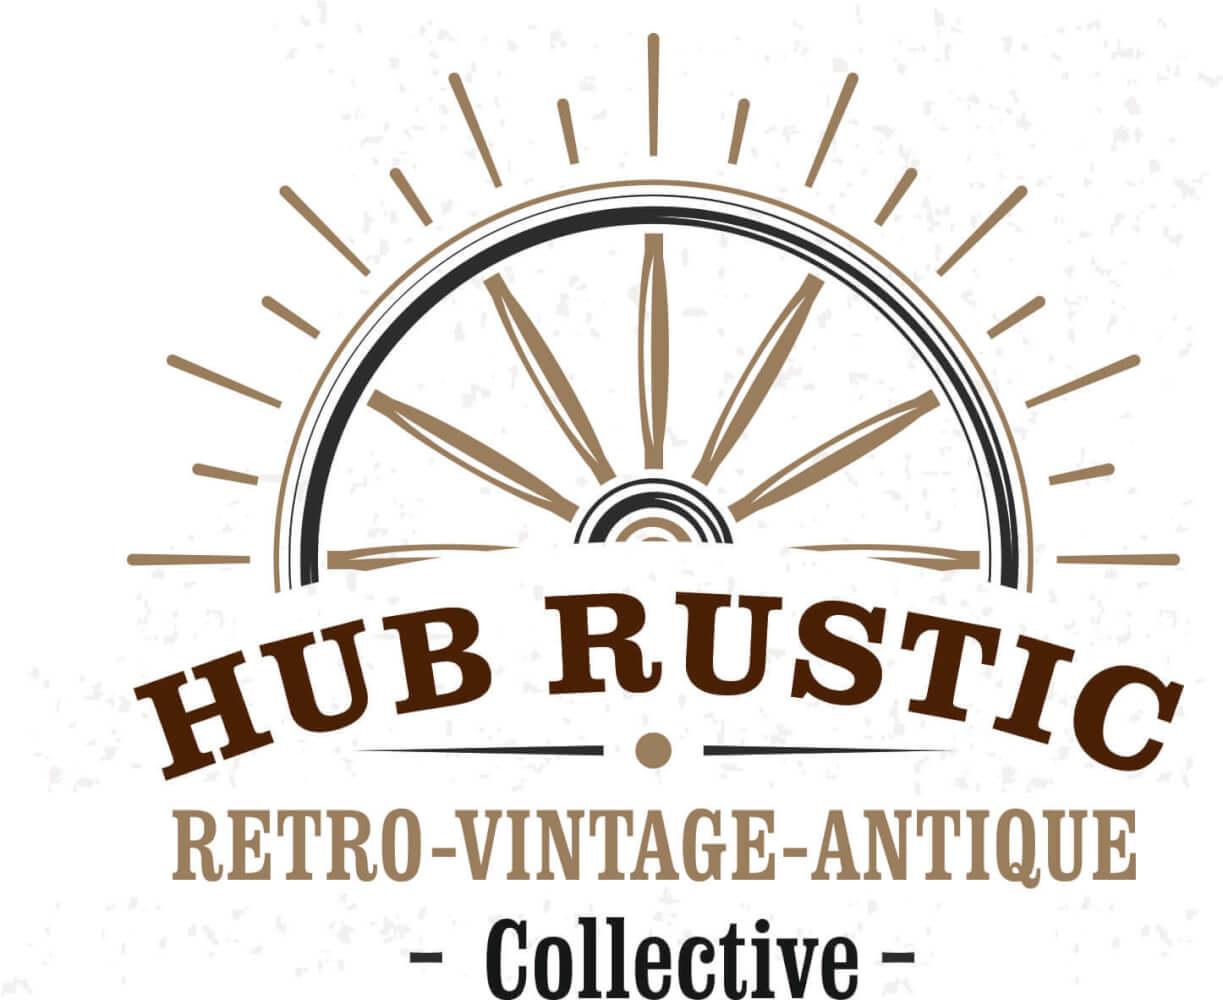 Hub Rustic